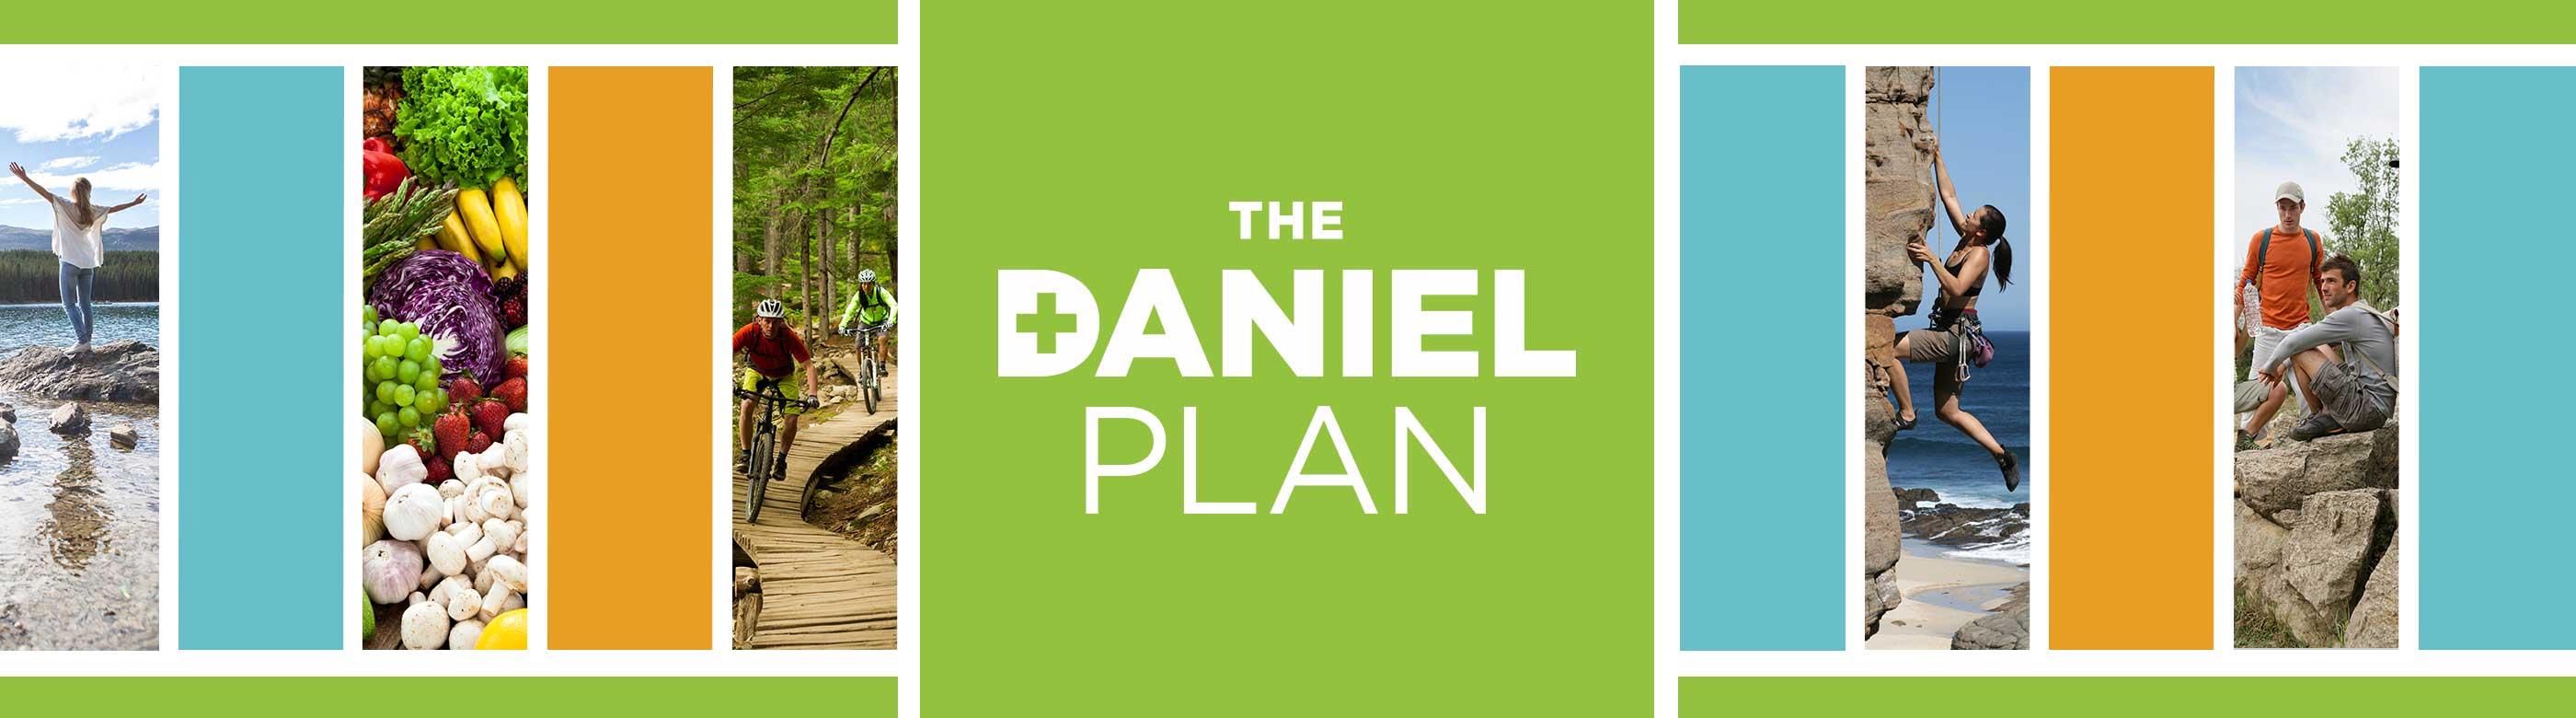 Saddleback Church: Ministries: The Daniel Plan